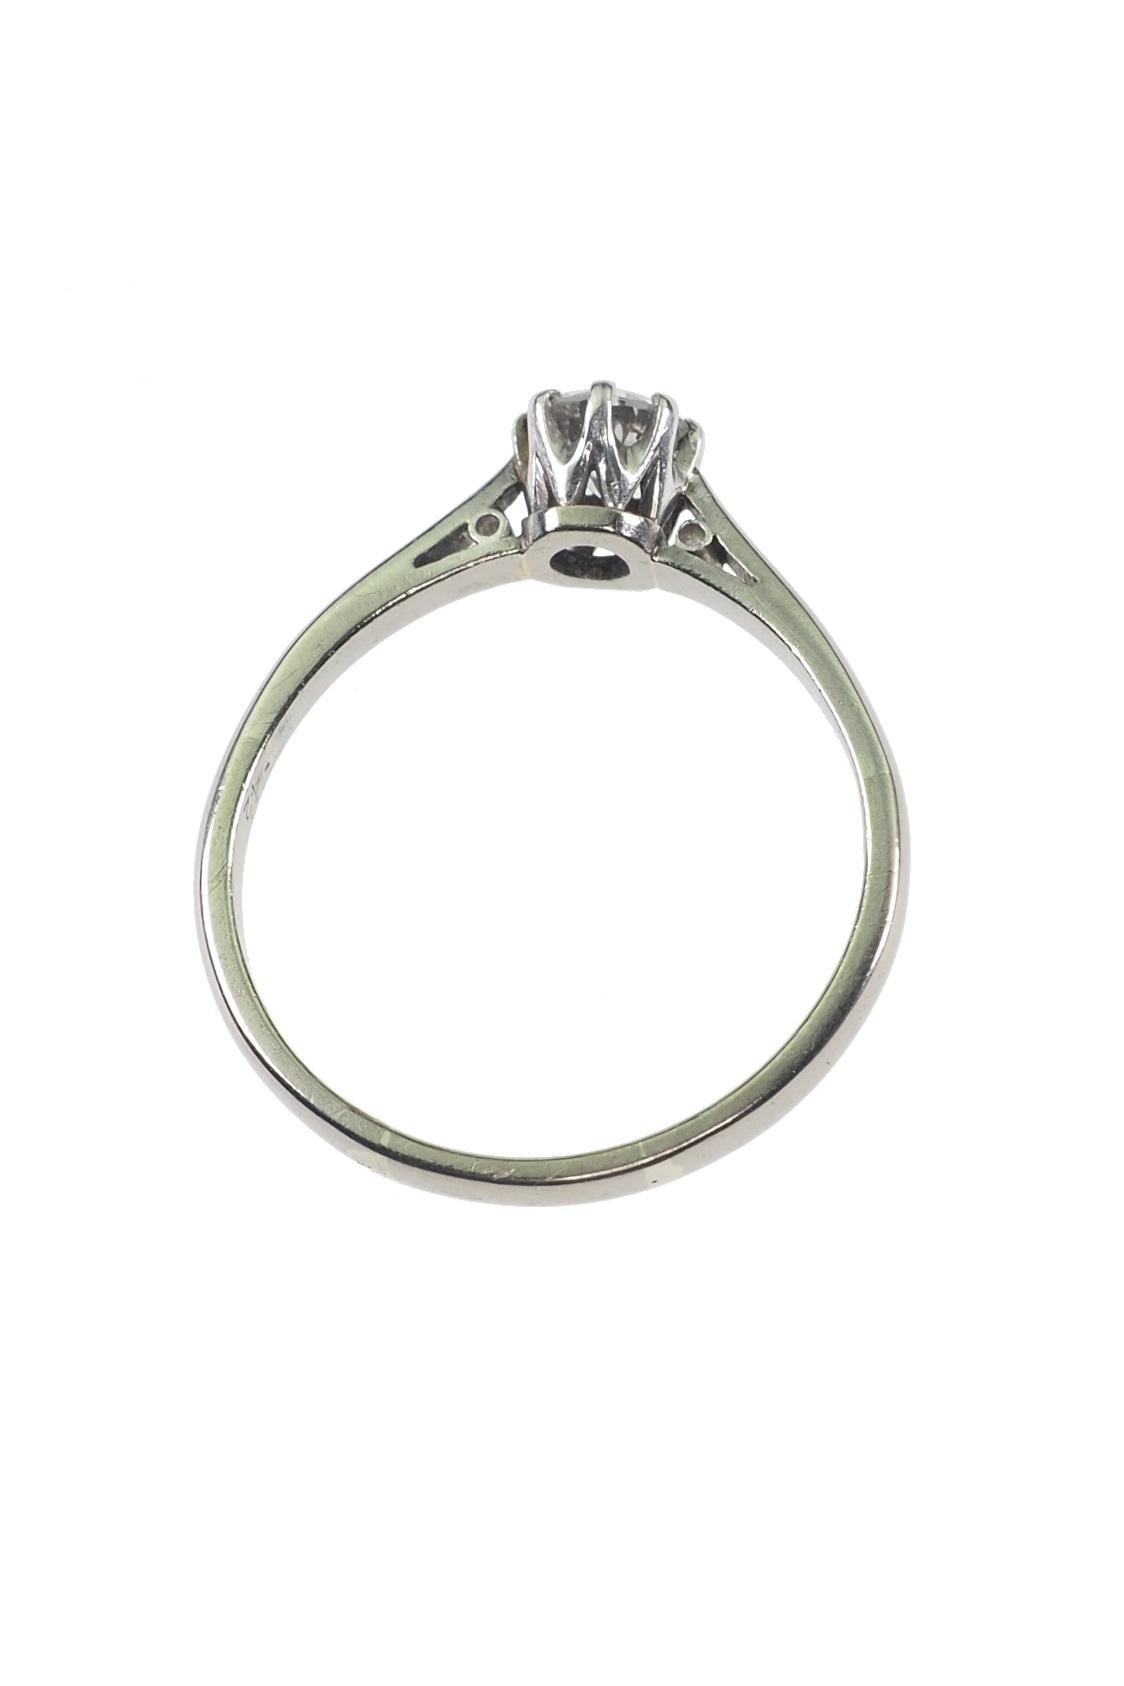 antike-Verlobungsringe-kaufen-2689b